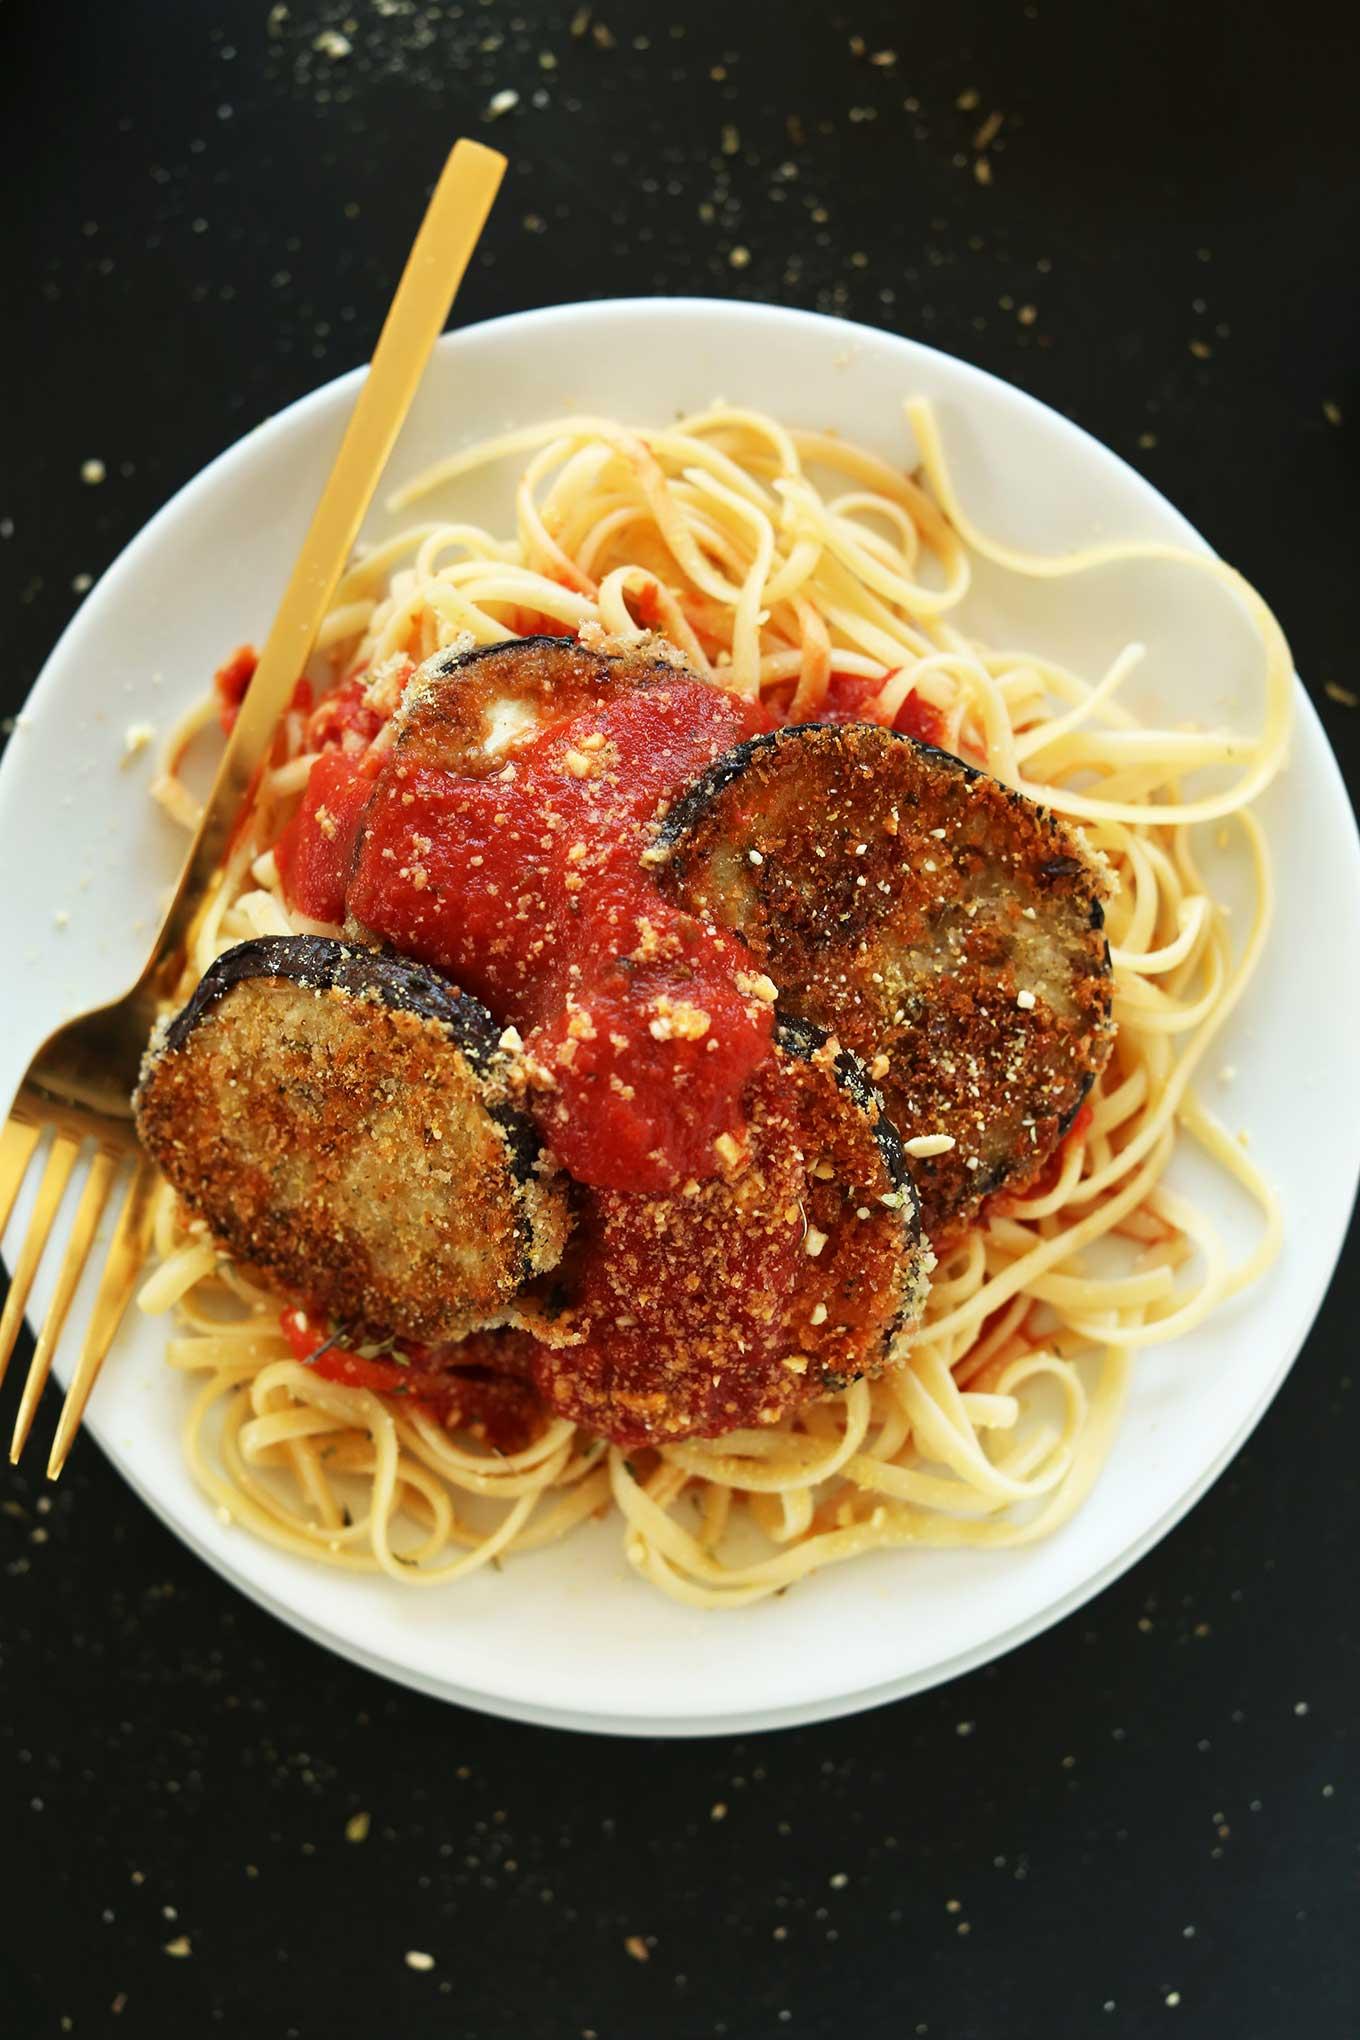 AMAZING-Vegan-Eggplant-Parmesan-Pasta-Crispy-delicious-perfect-on-top-of-your-favorite-pasta-vegan